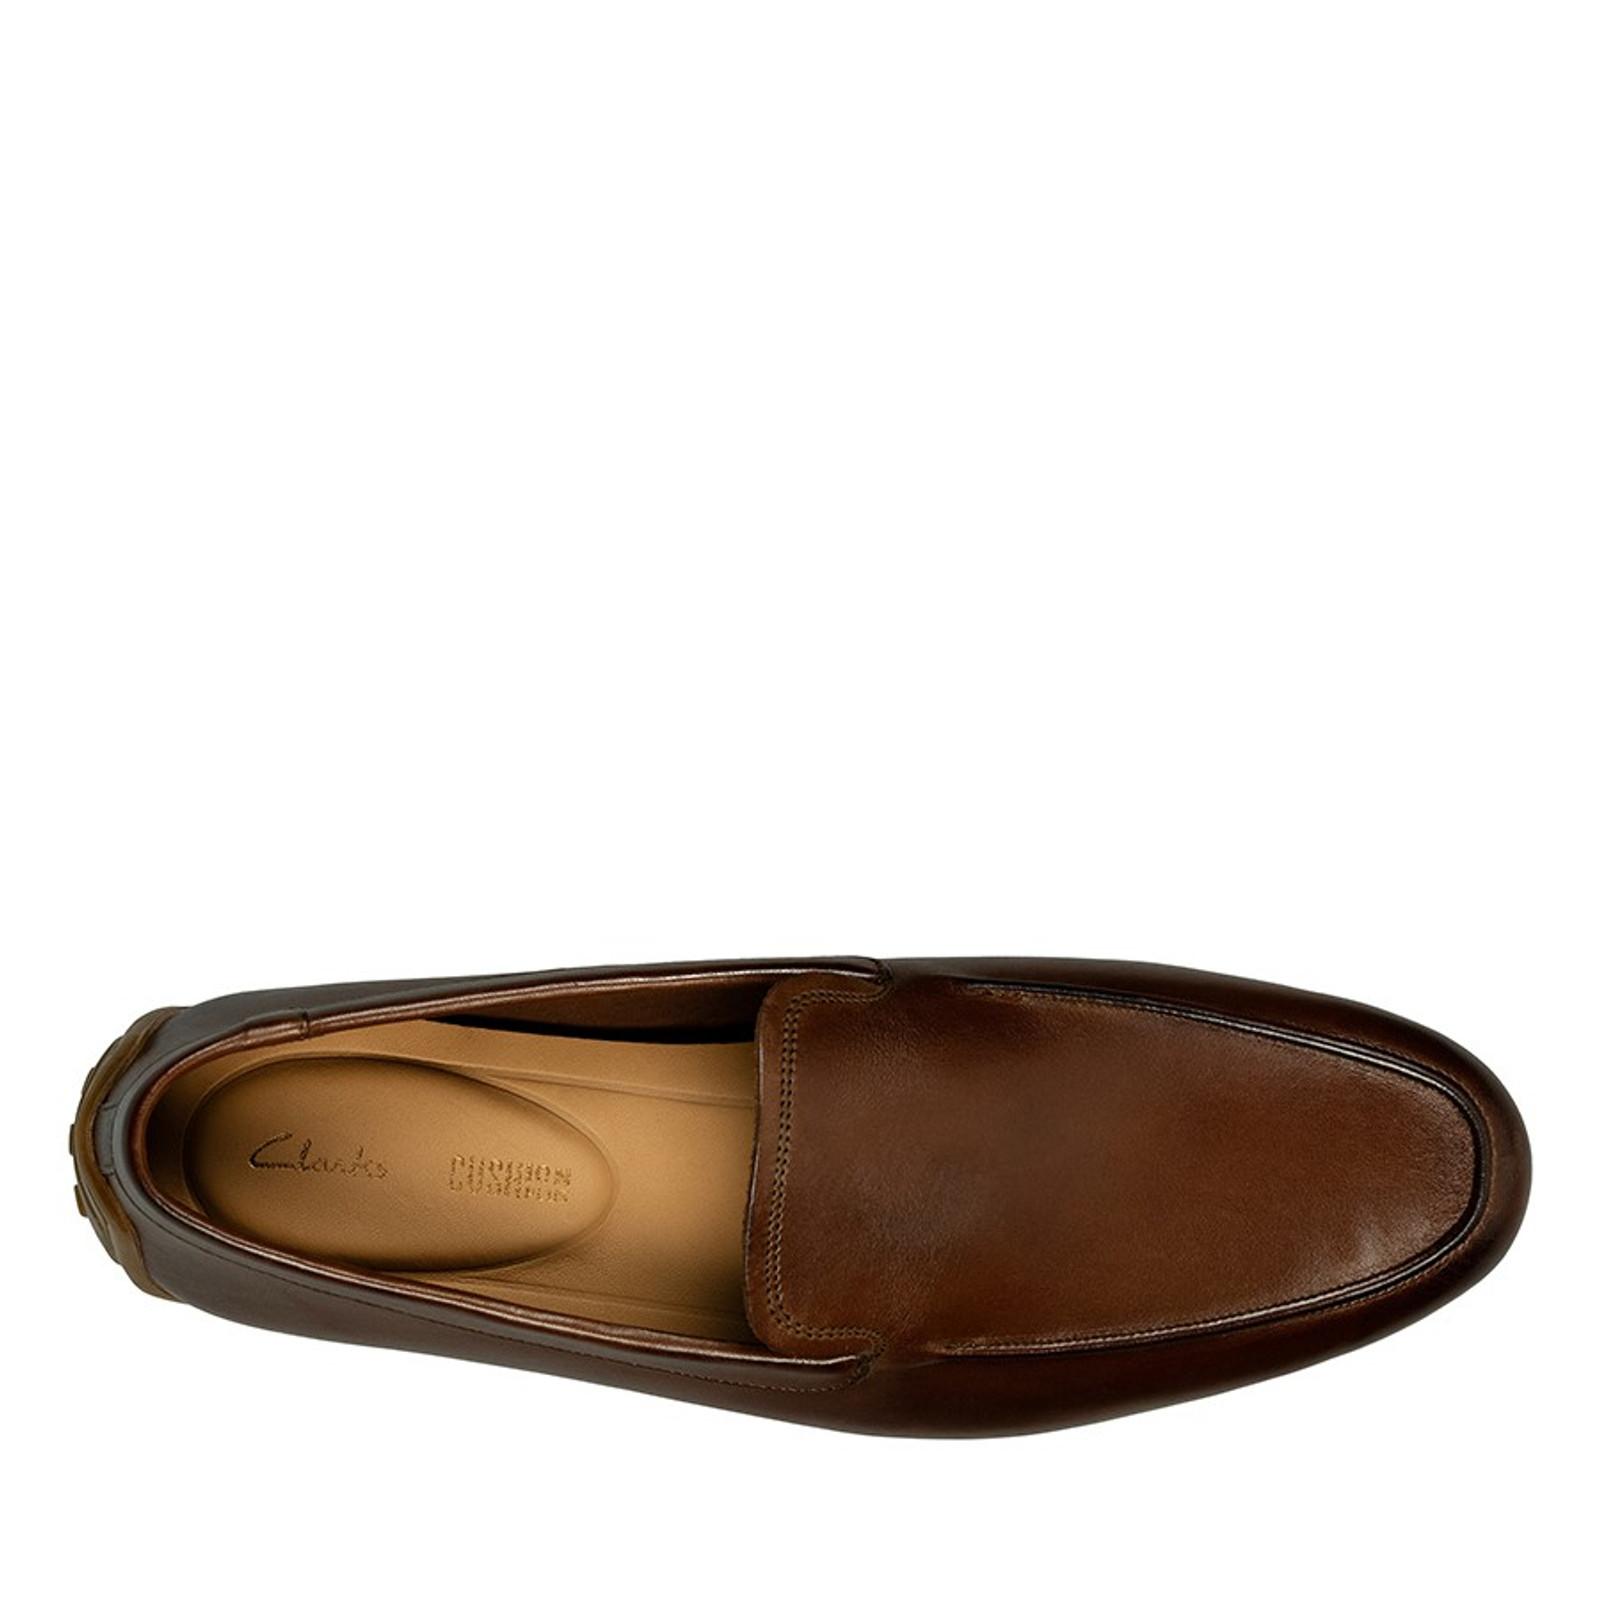 Clarks Mens REAZOR PLAIN British Tan Leather